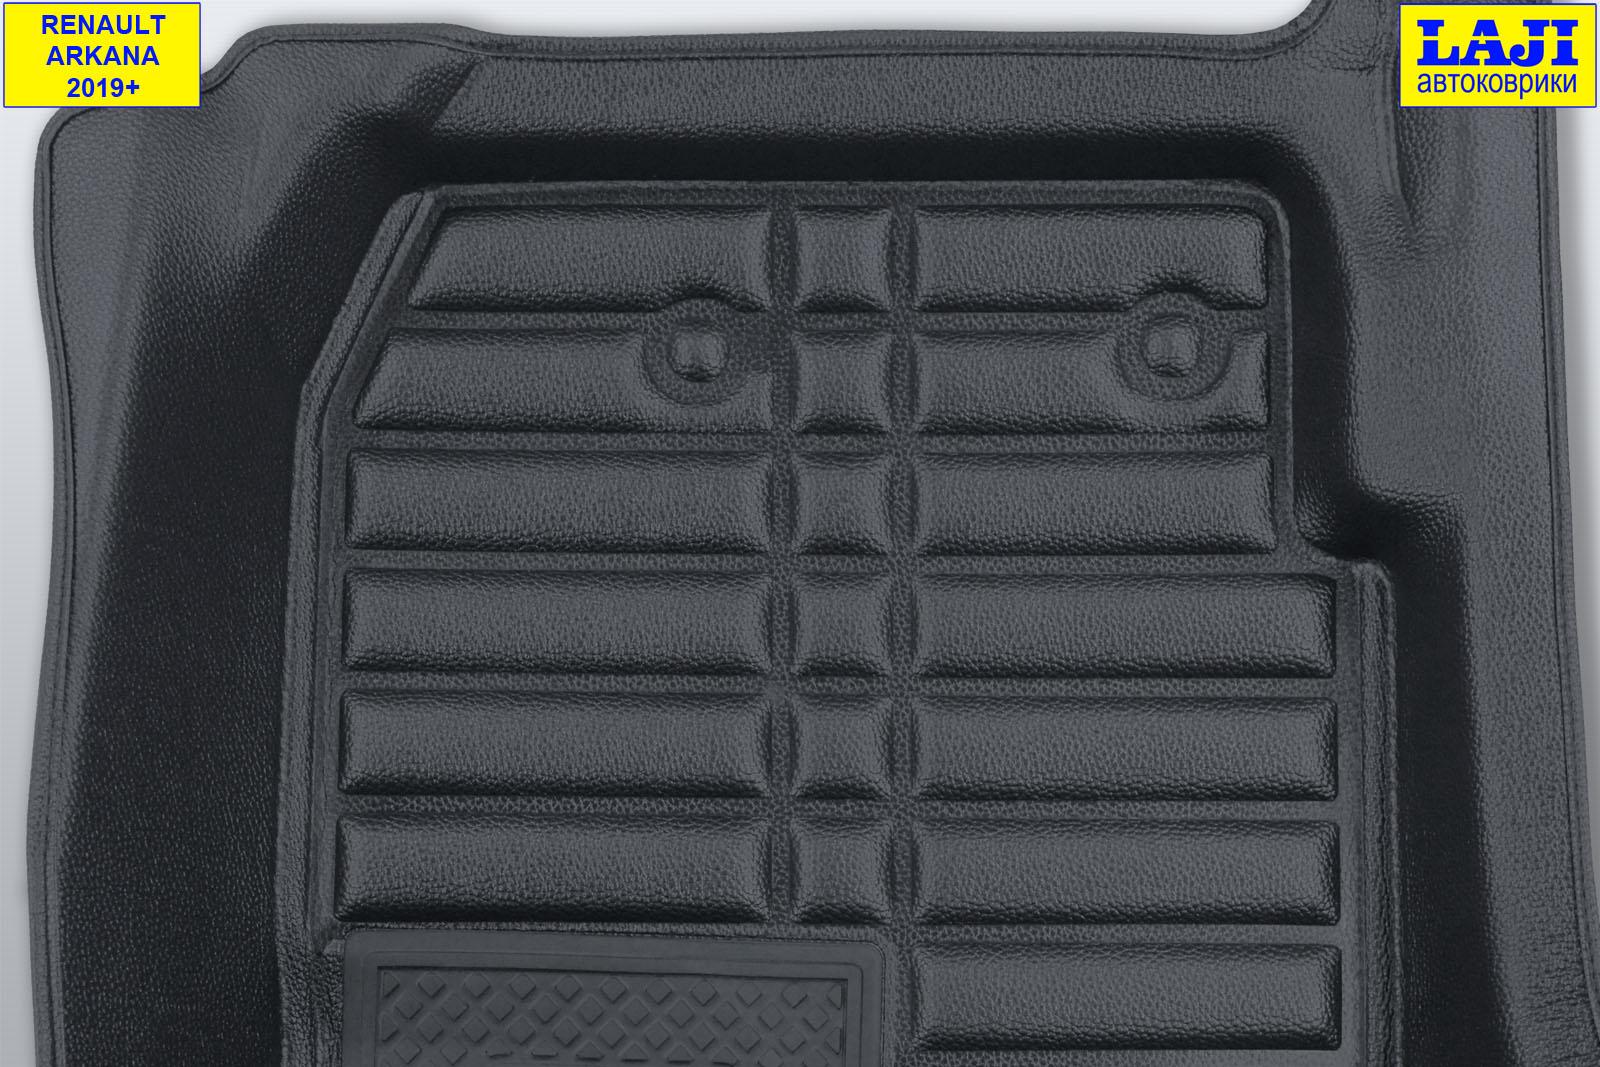 5D коврики в салон Renault Arkana 2019-н.в. 8